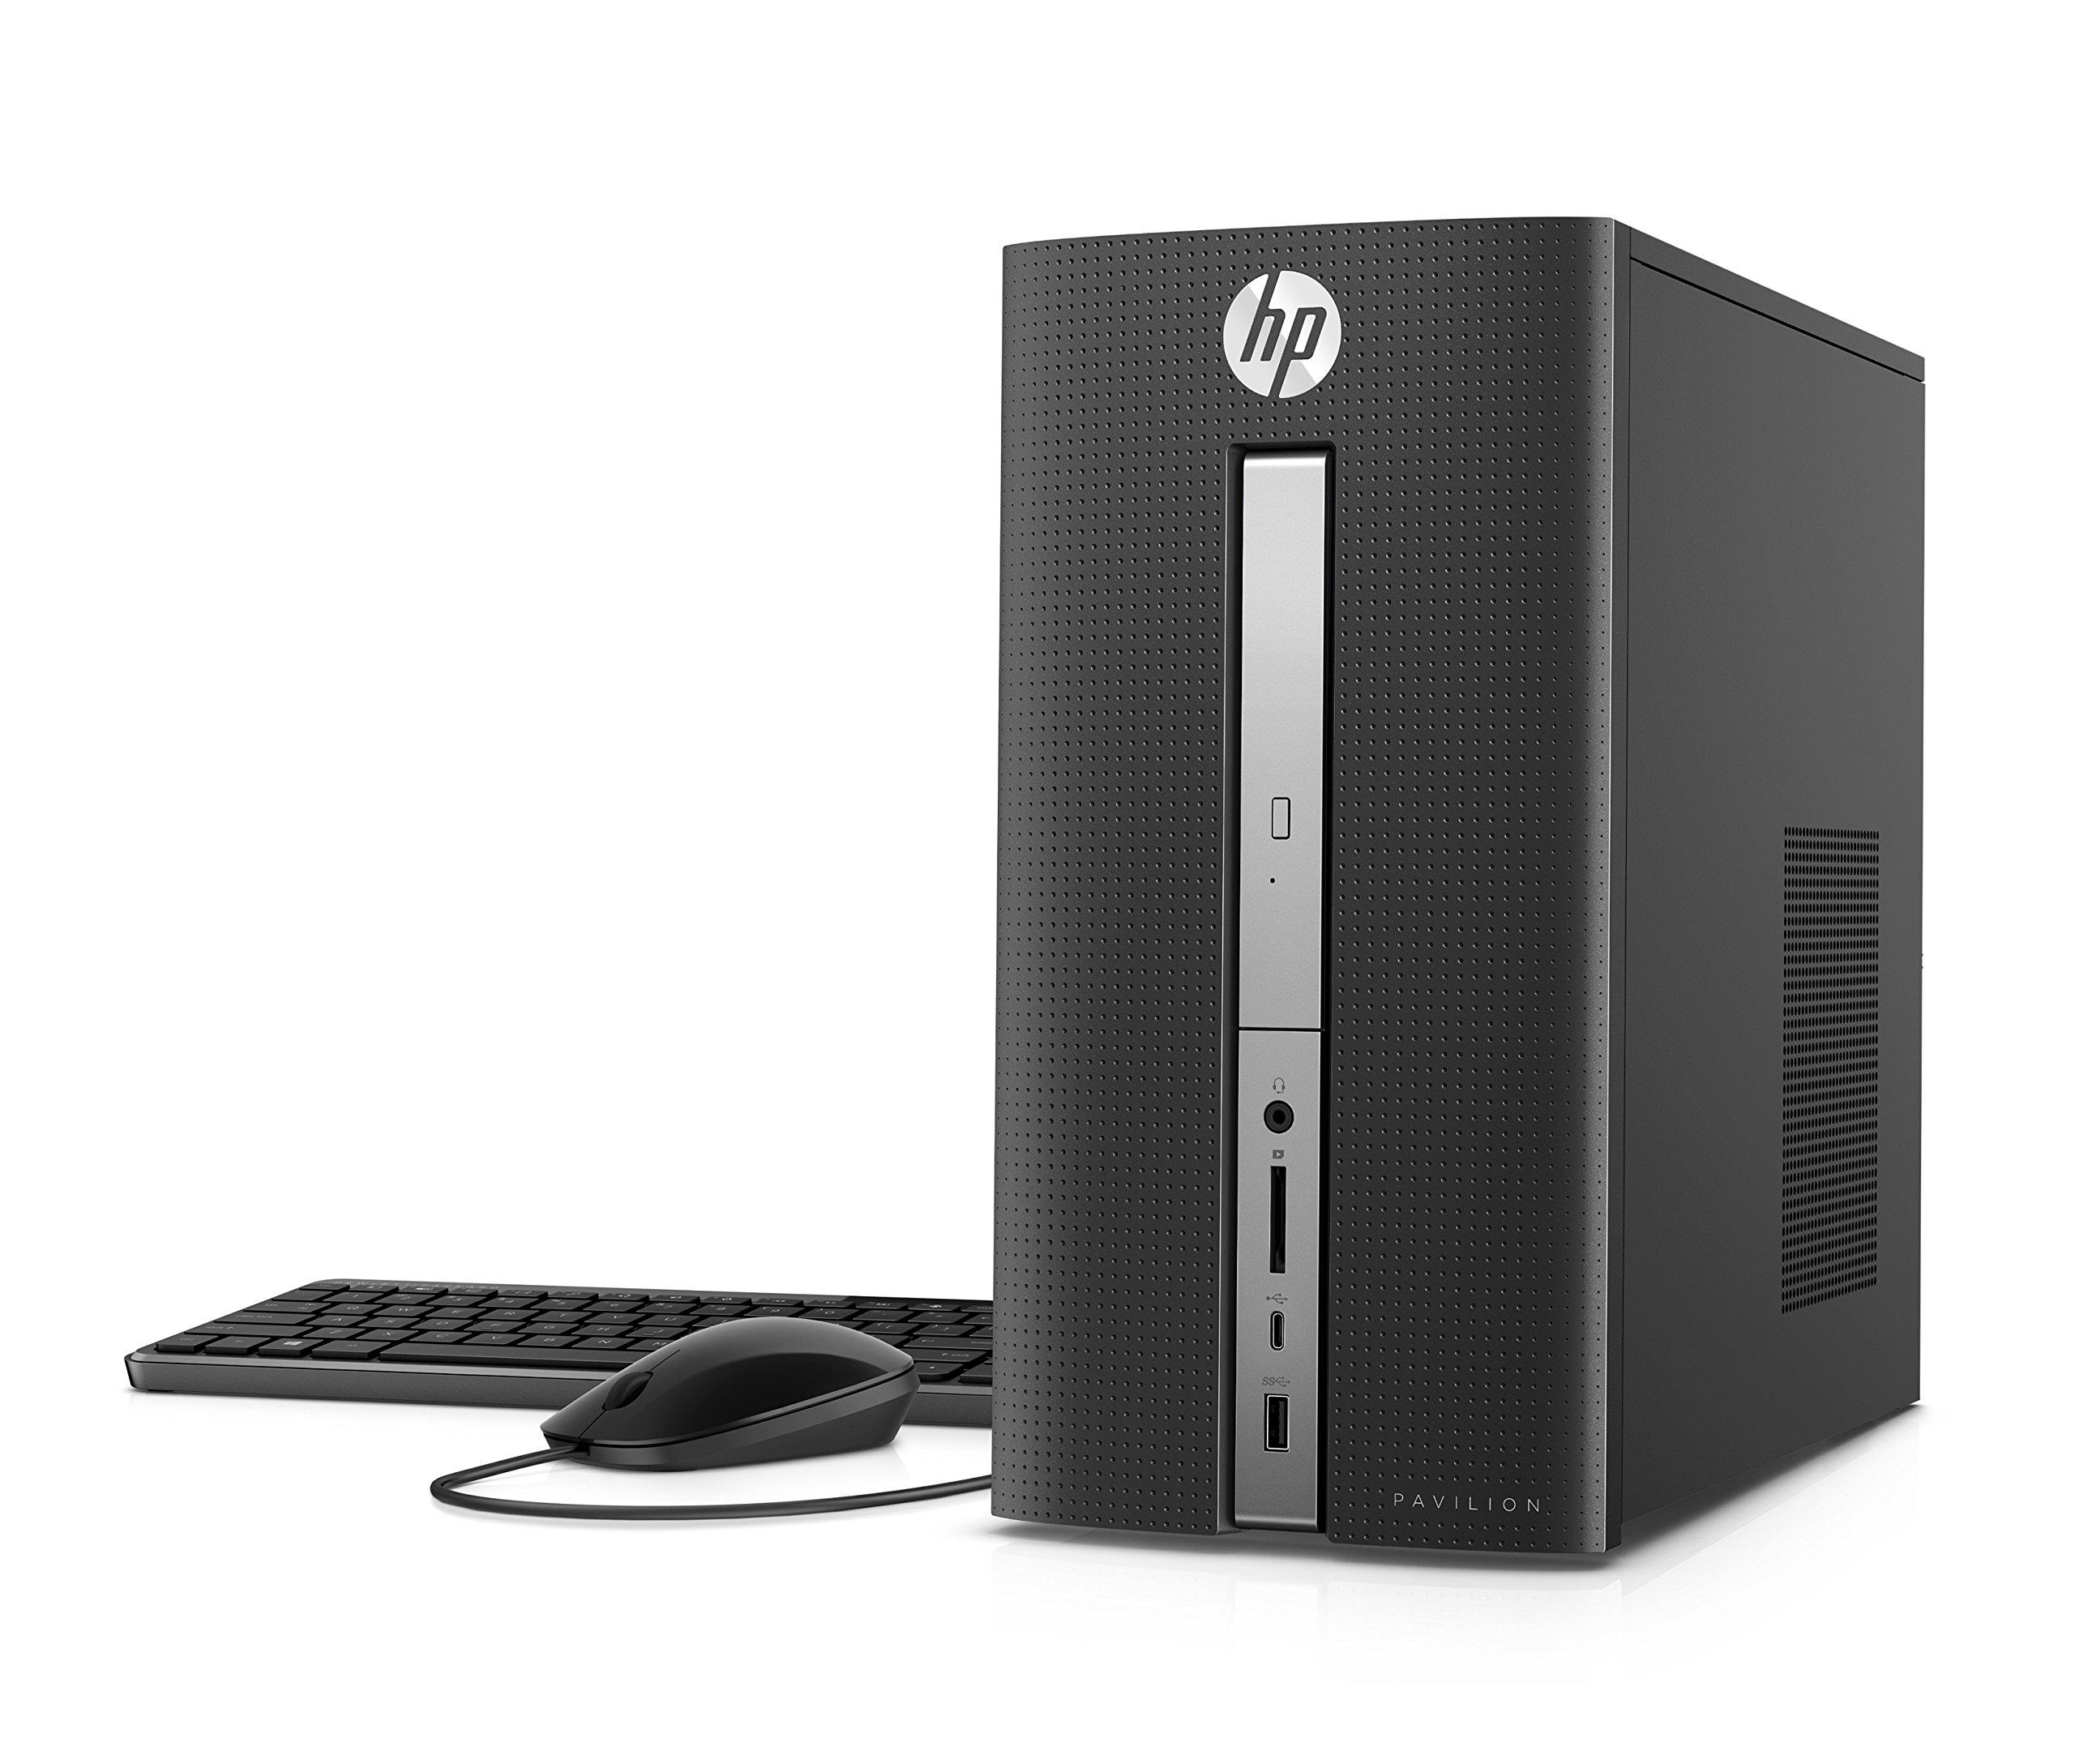 HP Pavilion Desktop Computer, Intel Core i7-7700, 12GB RAM, 1TB hard drive, Windows 10 (570-p030, Black) by HP